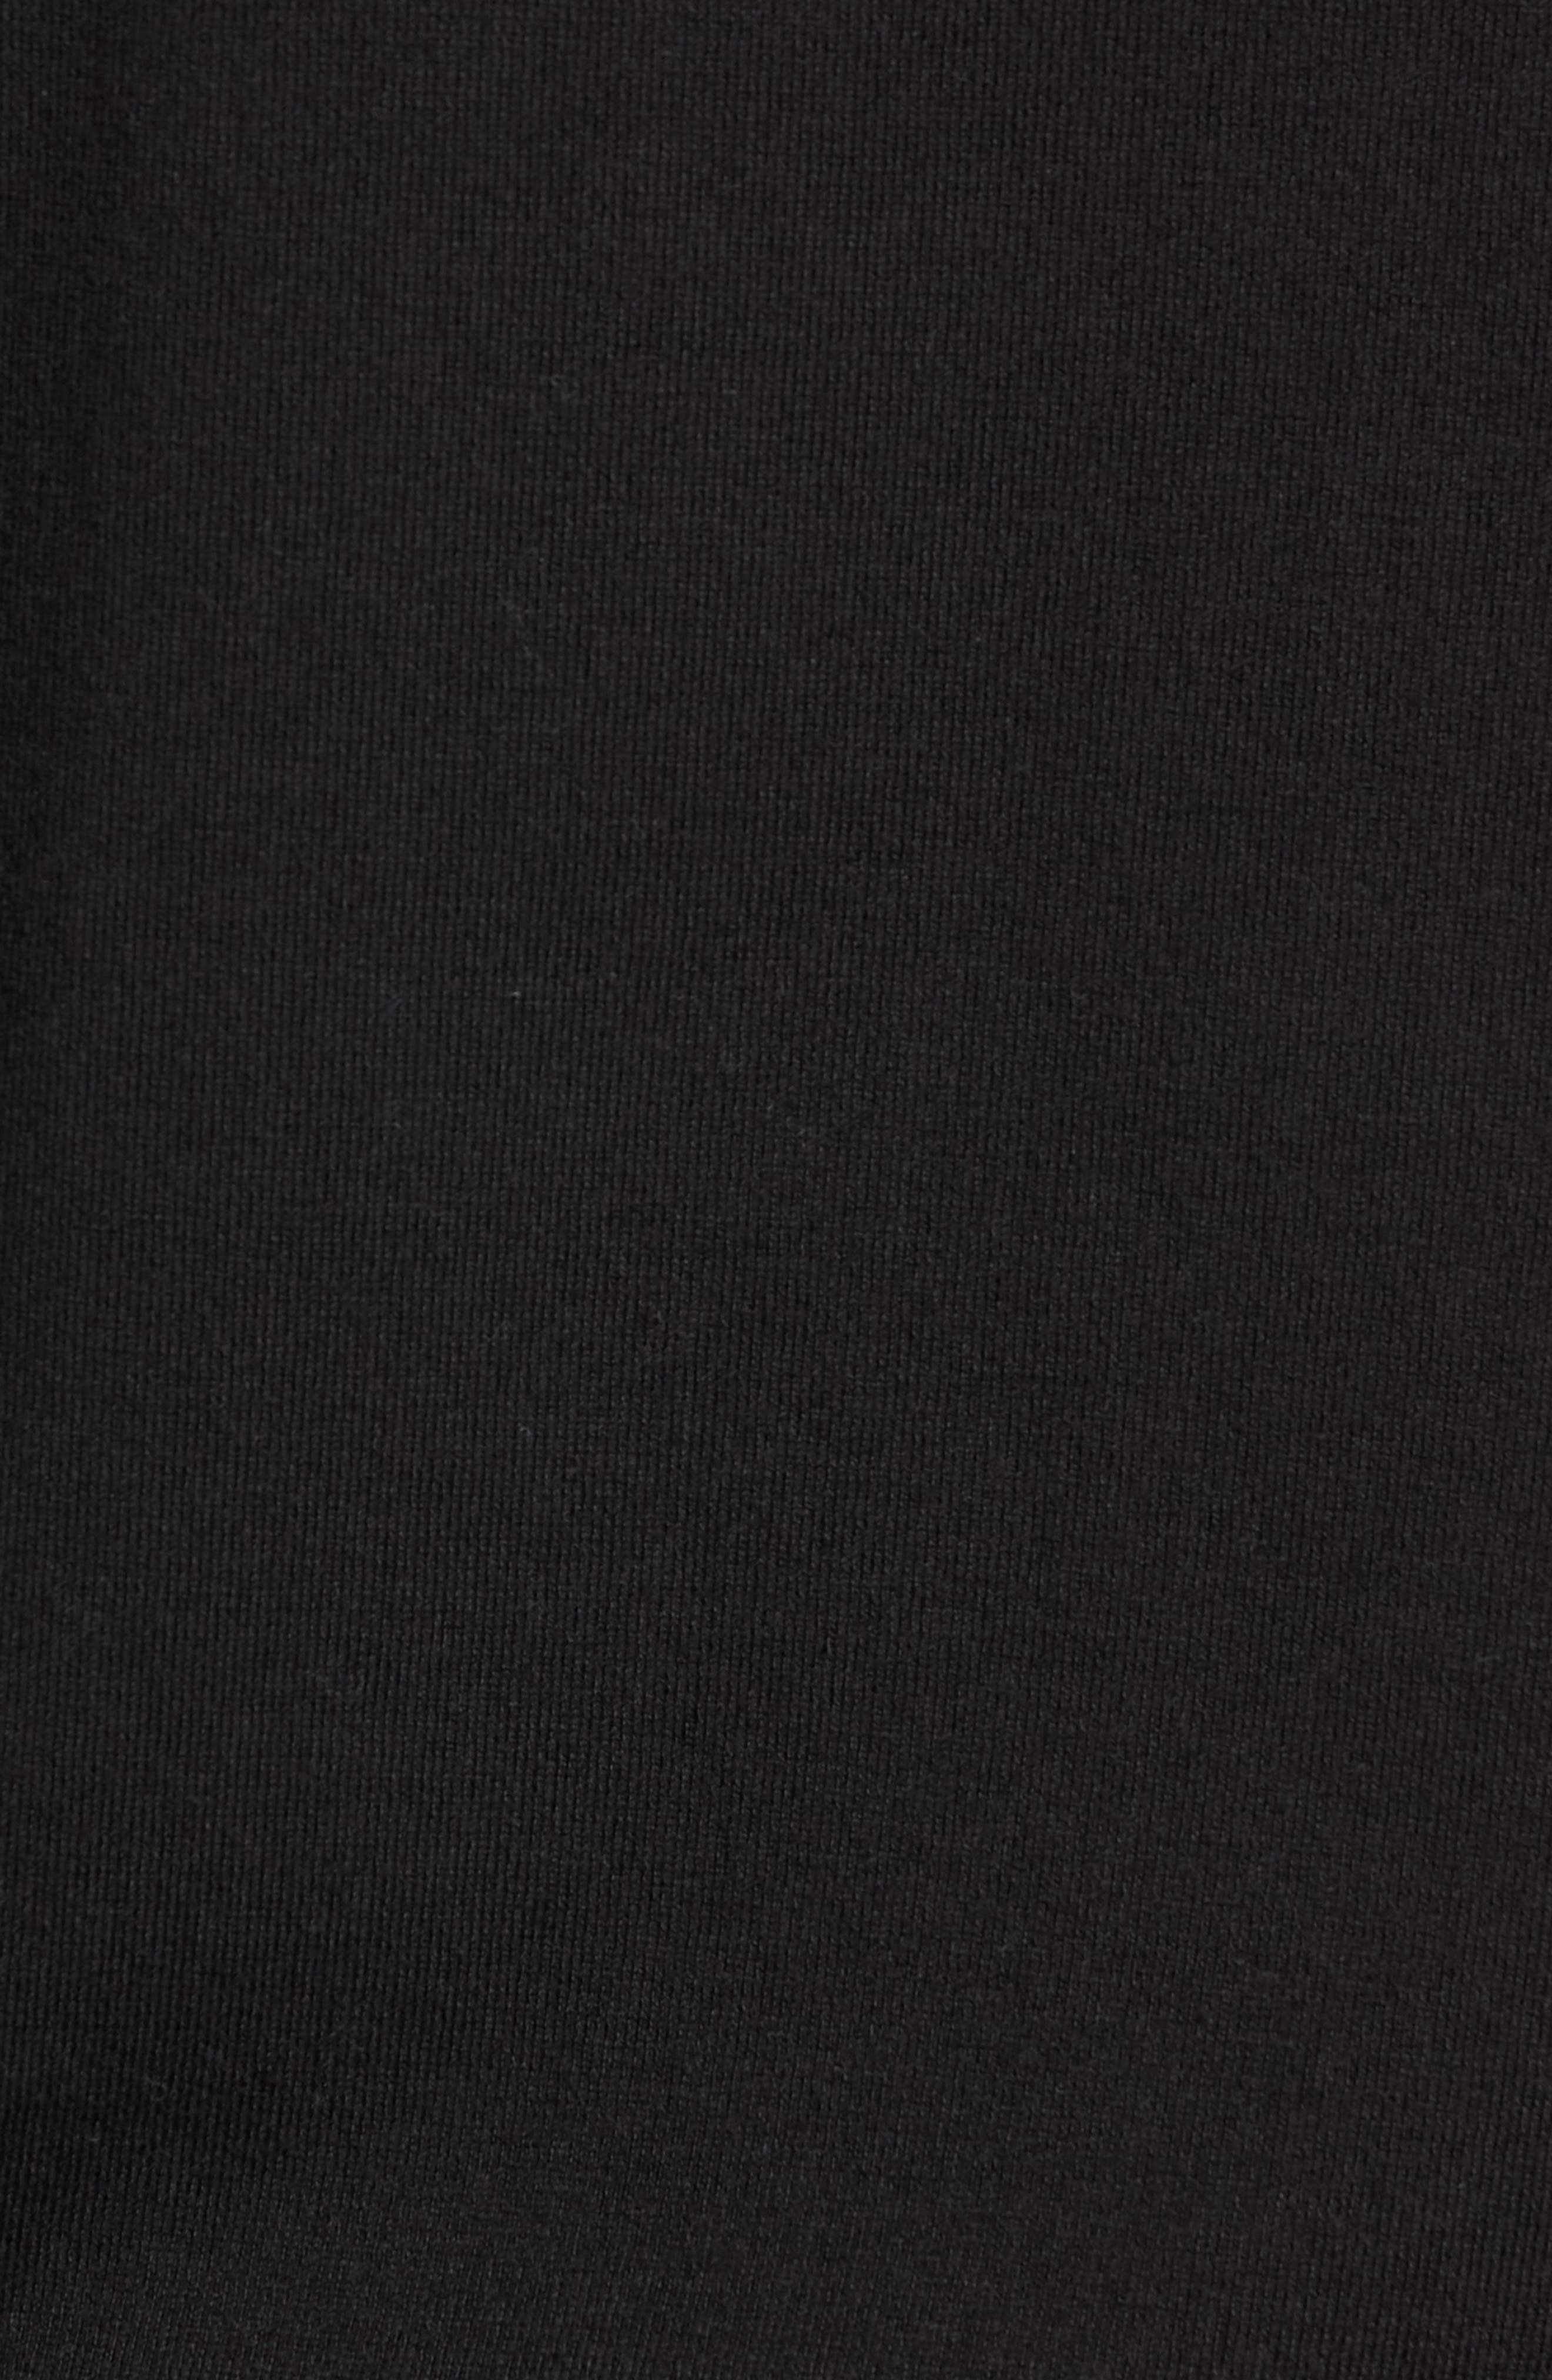 Regular Fit Stretch Cotton Crewneck Sweater,                             Alternate thumbnail 5, color,                             BLACK